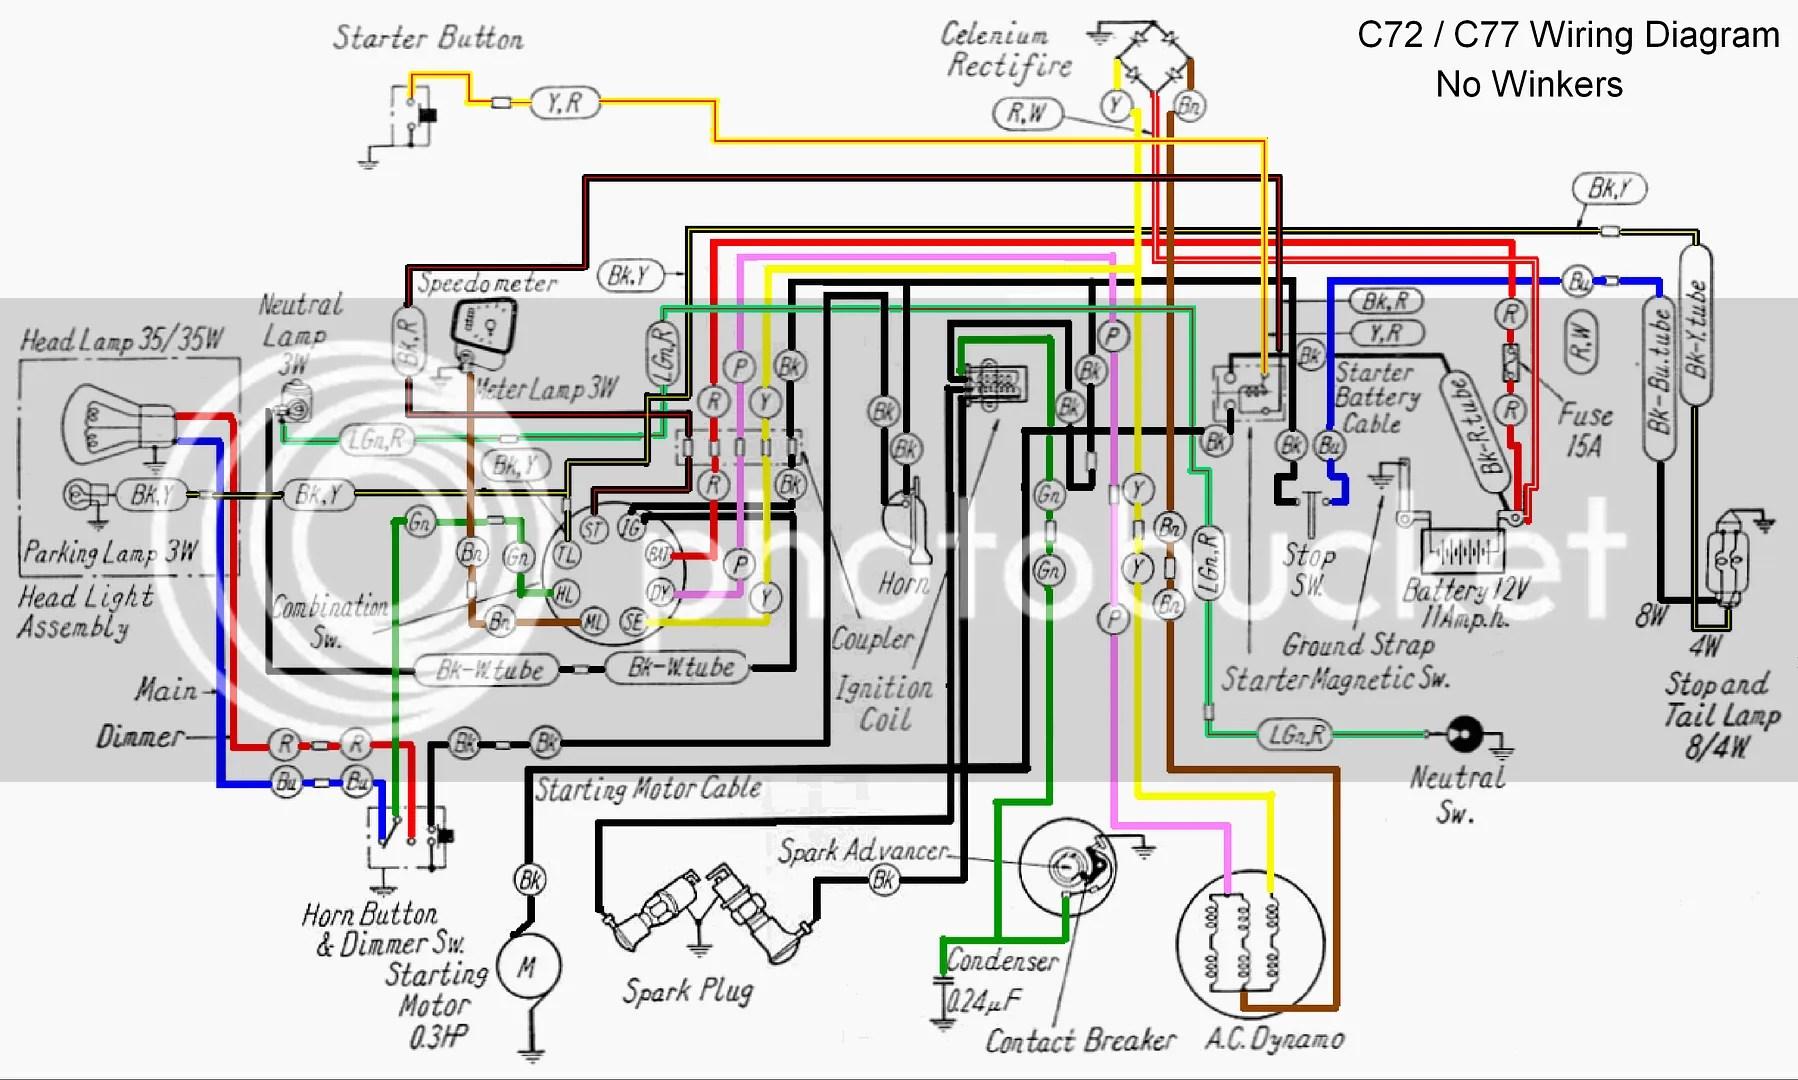 medium resolution of honda dream yuga wiring diagram manual e books kawasaki kx80 wiring diagram honda dream wiring diagram